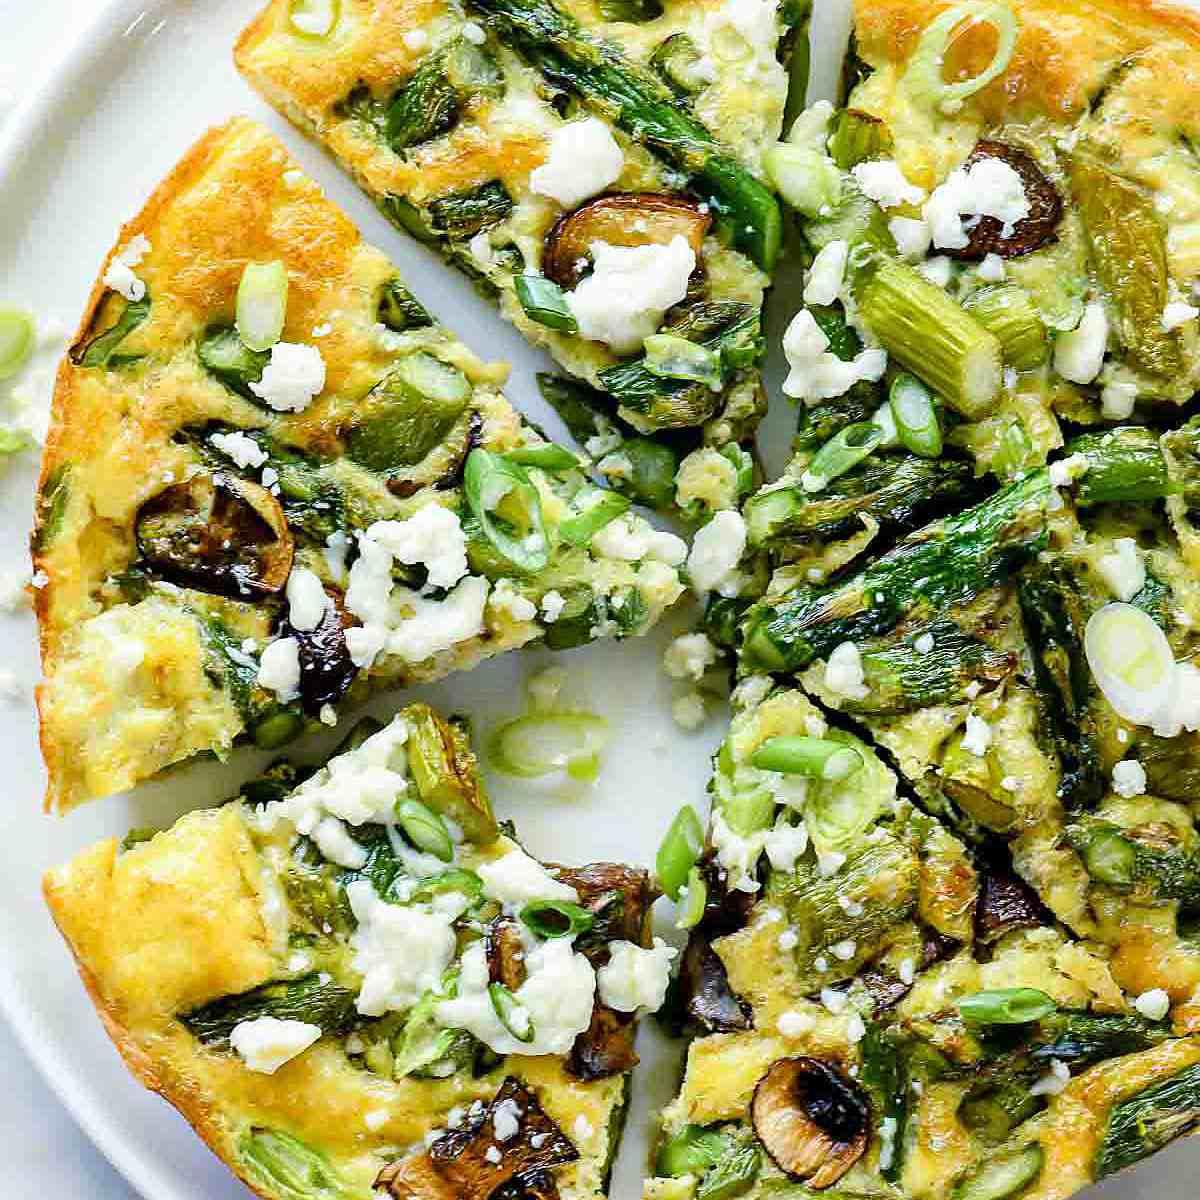 Asparagus And Mushroom Frittata With Goat Cheese—Easy Asparagus Recipes